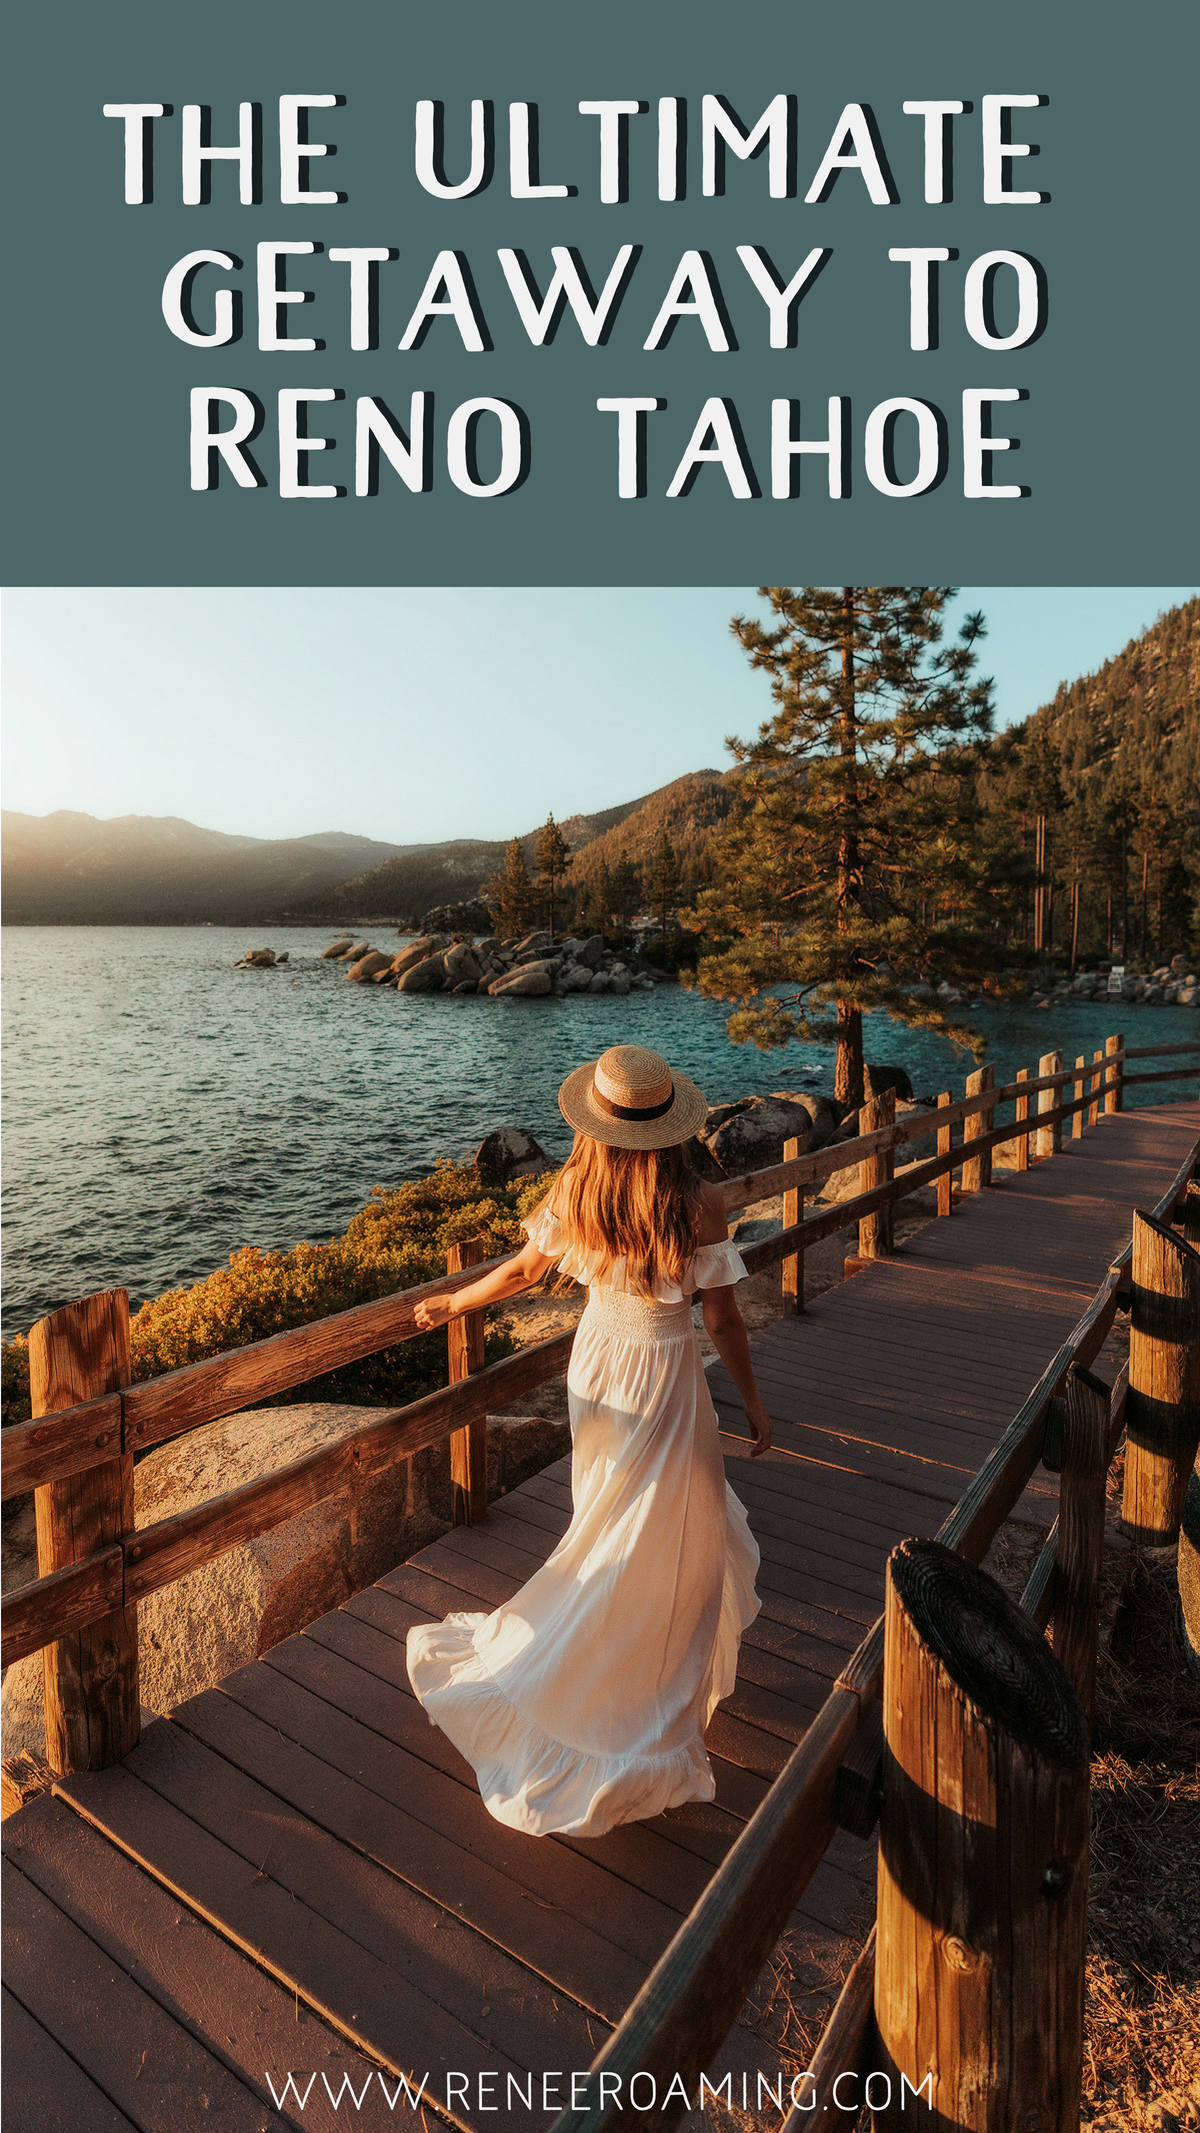 The Ultimate Adventure Getaway to Reno and Lake Tahoe - Renee Roaming